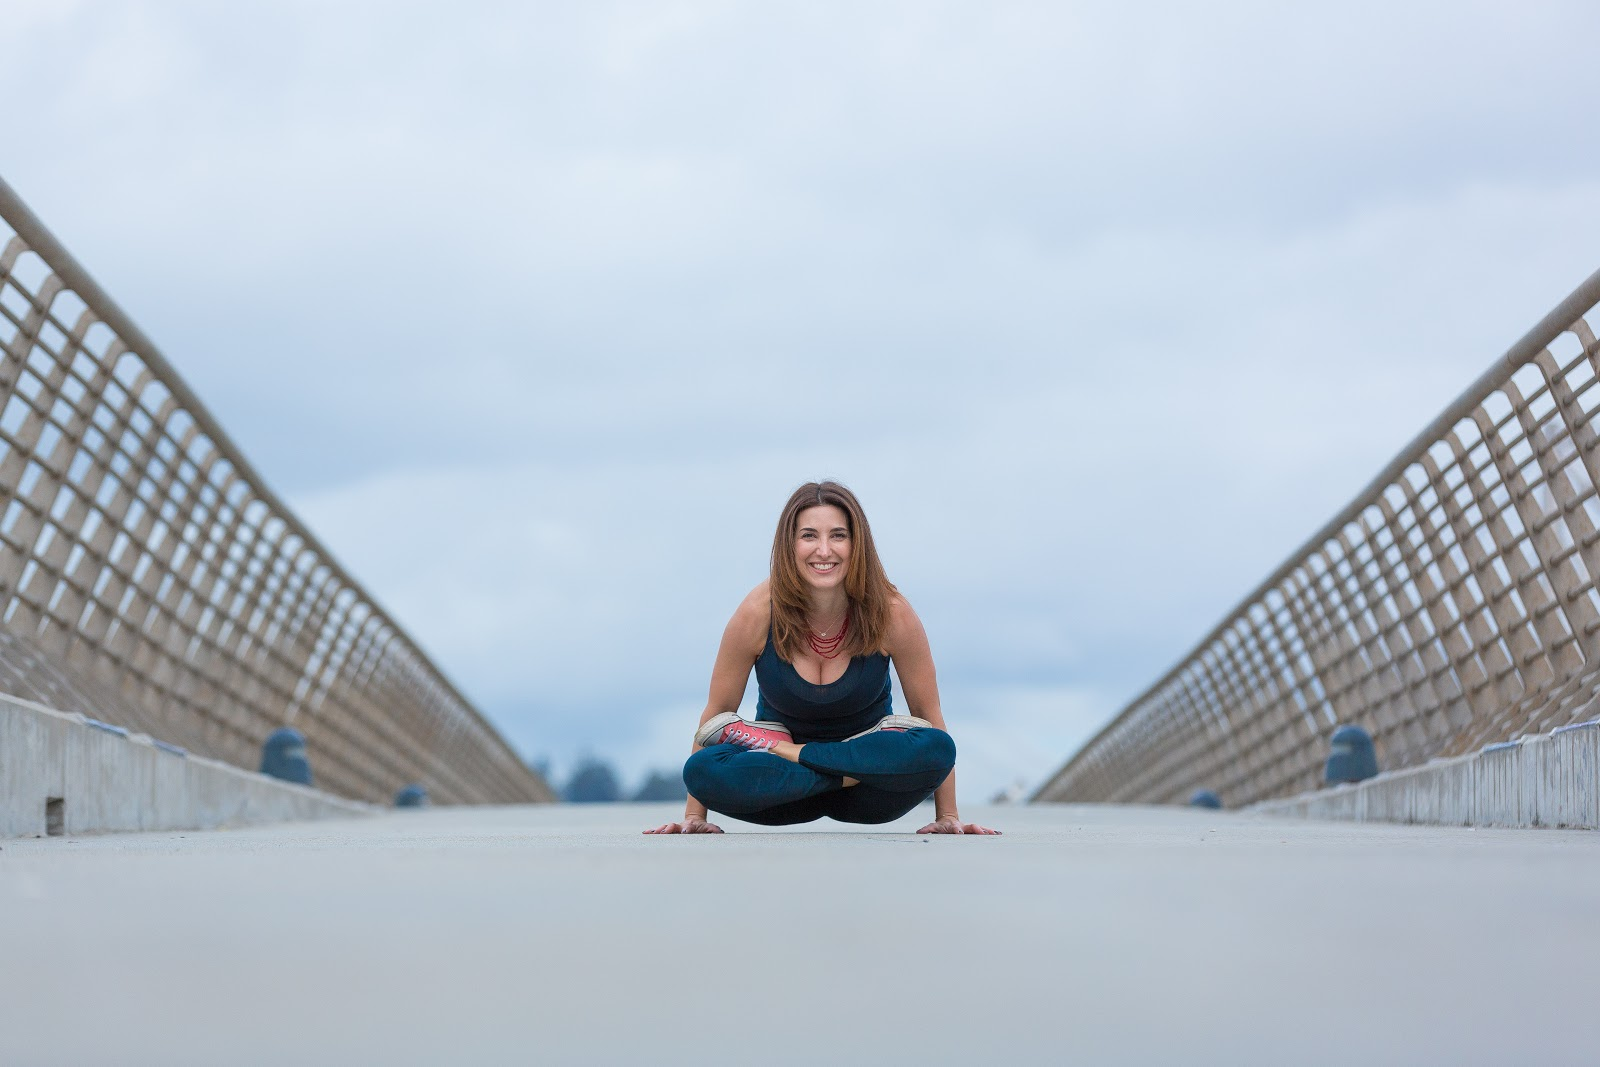 Yoga Retreats 2019 - Best yoga retreat 2019 Summer Her backpack Bliss